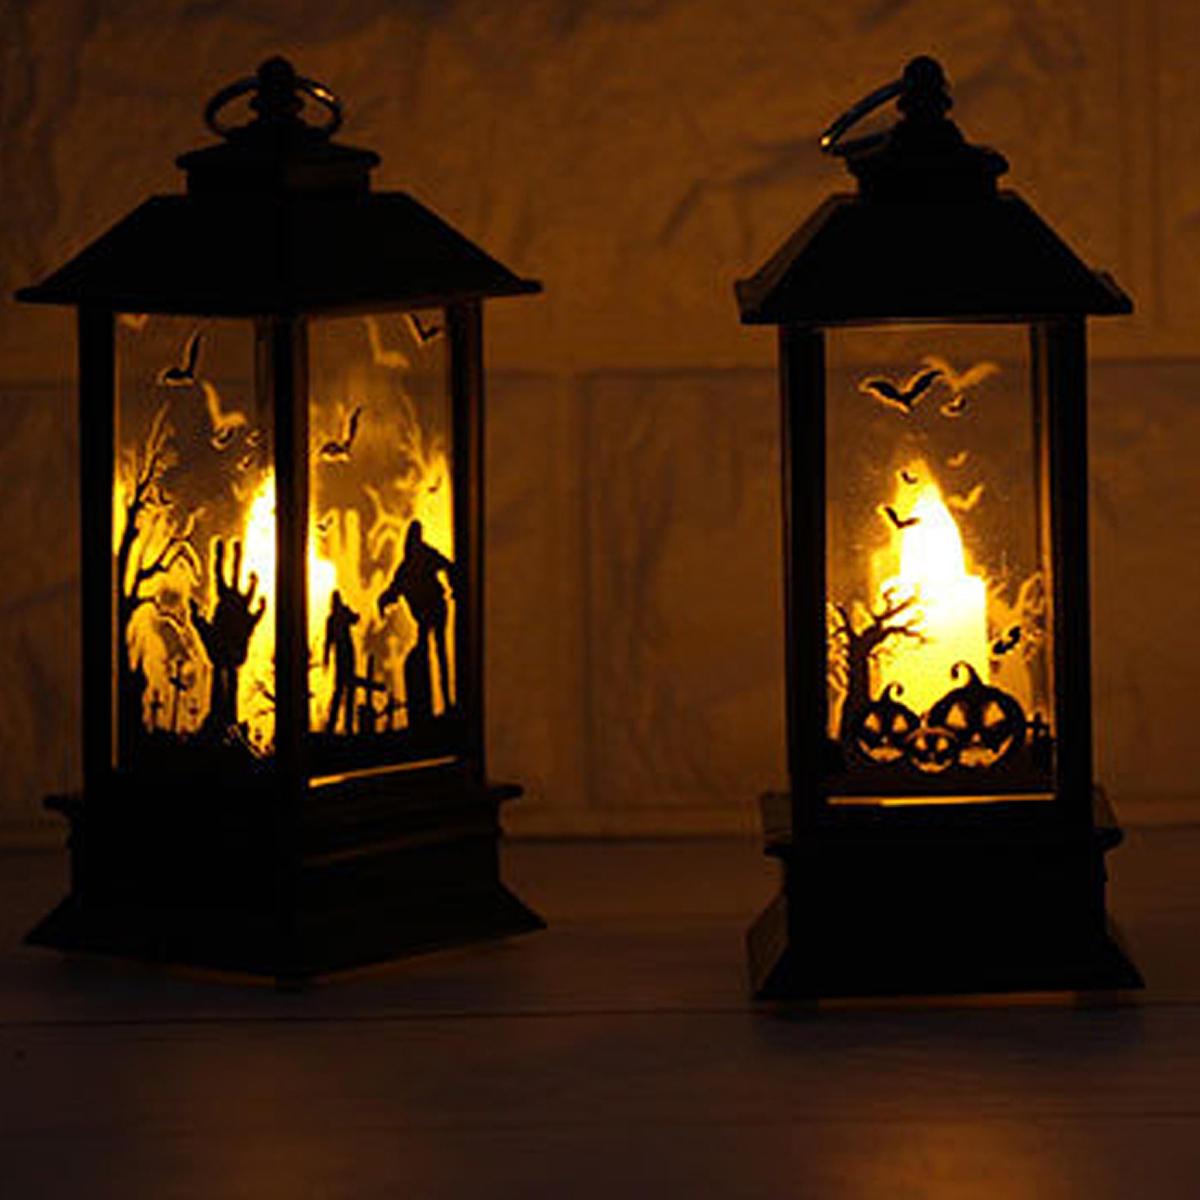 Hallowen Flame Lámpara Electronic LED Decoraciones para fiestas de velas